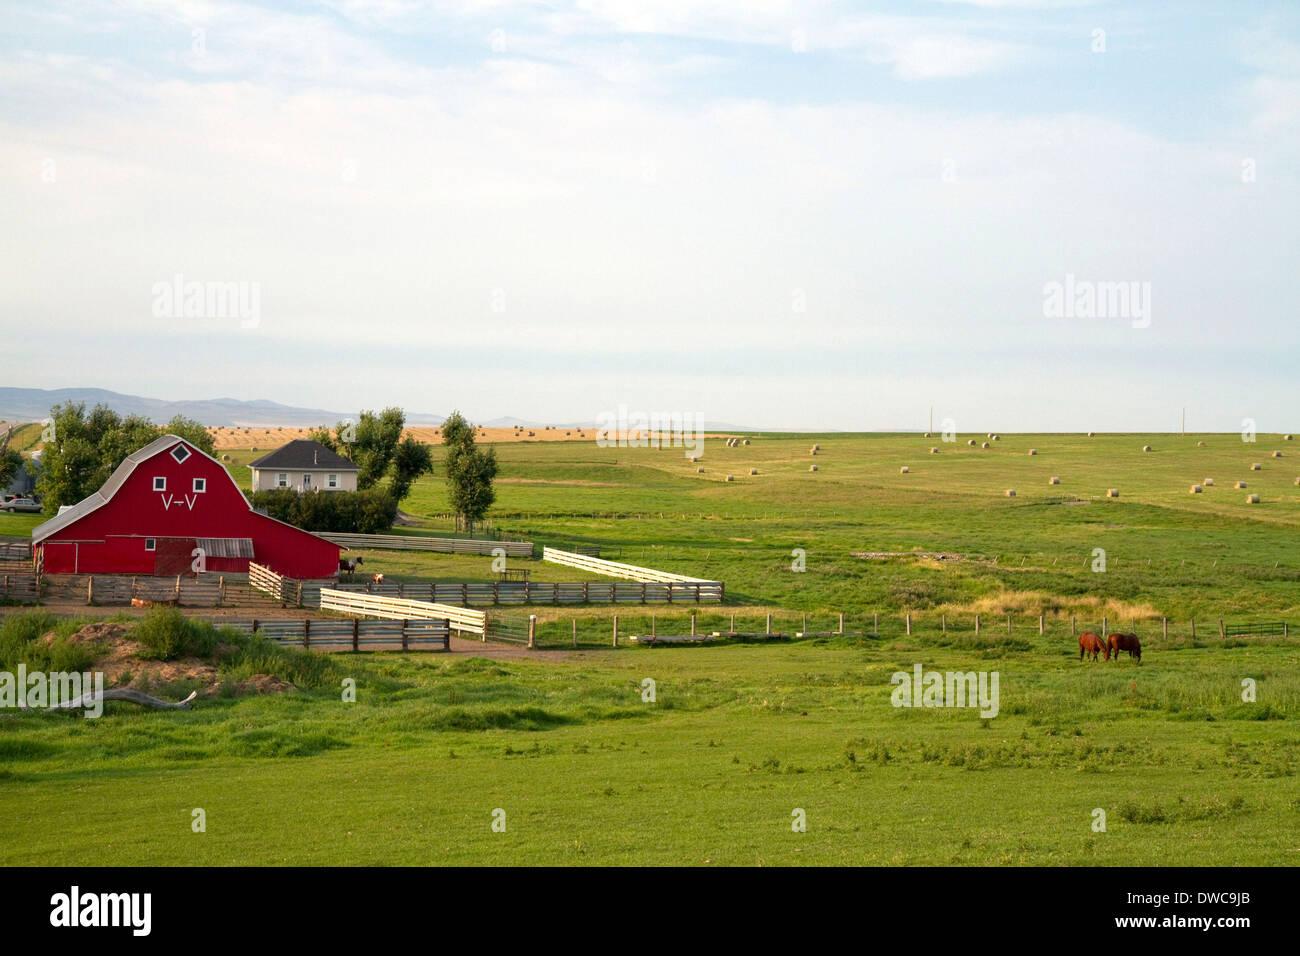 Red barn and farmland south of Pincher Creek, Alberta, Canada. - Stock Image